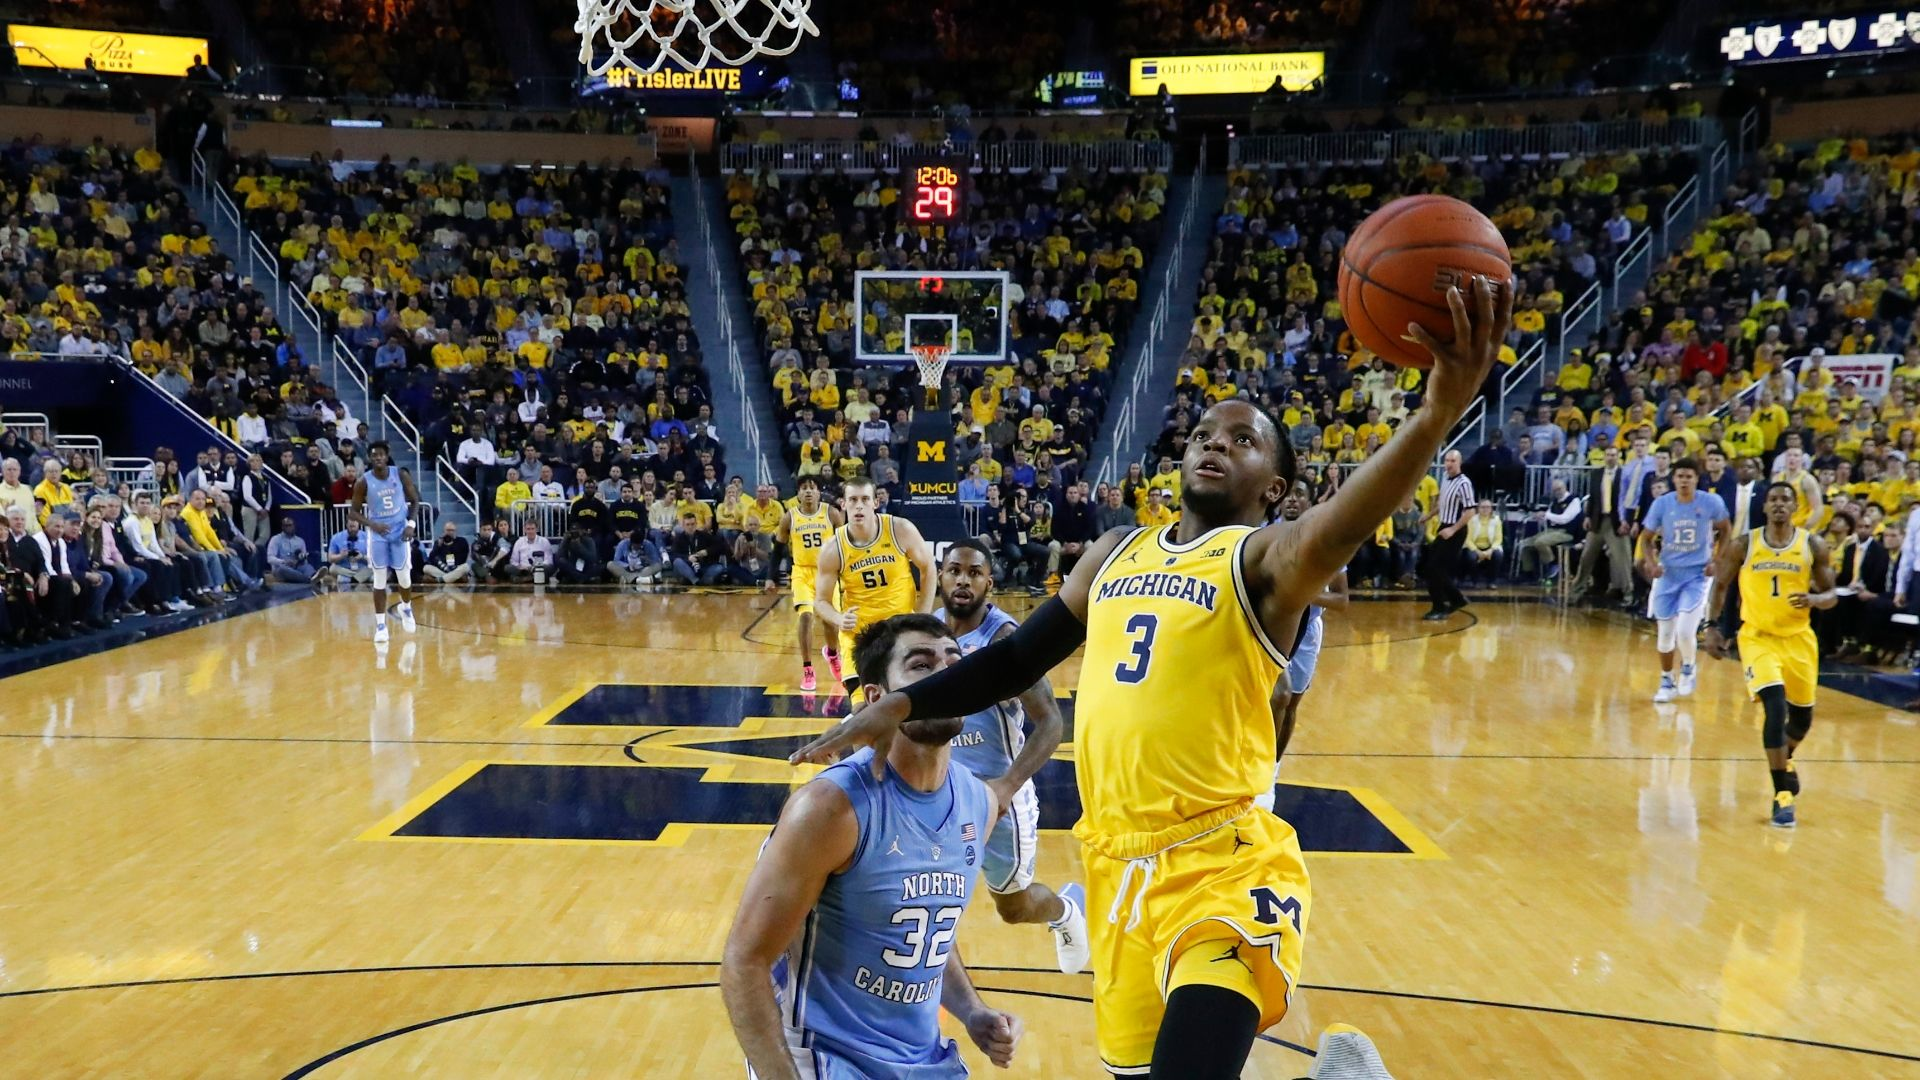 Michigan Trounces Unc To Stay Unbeaten Espn Video